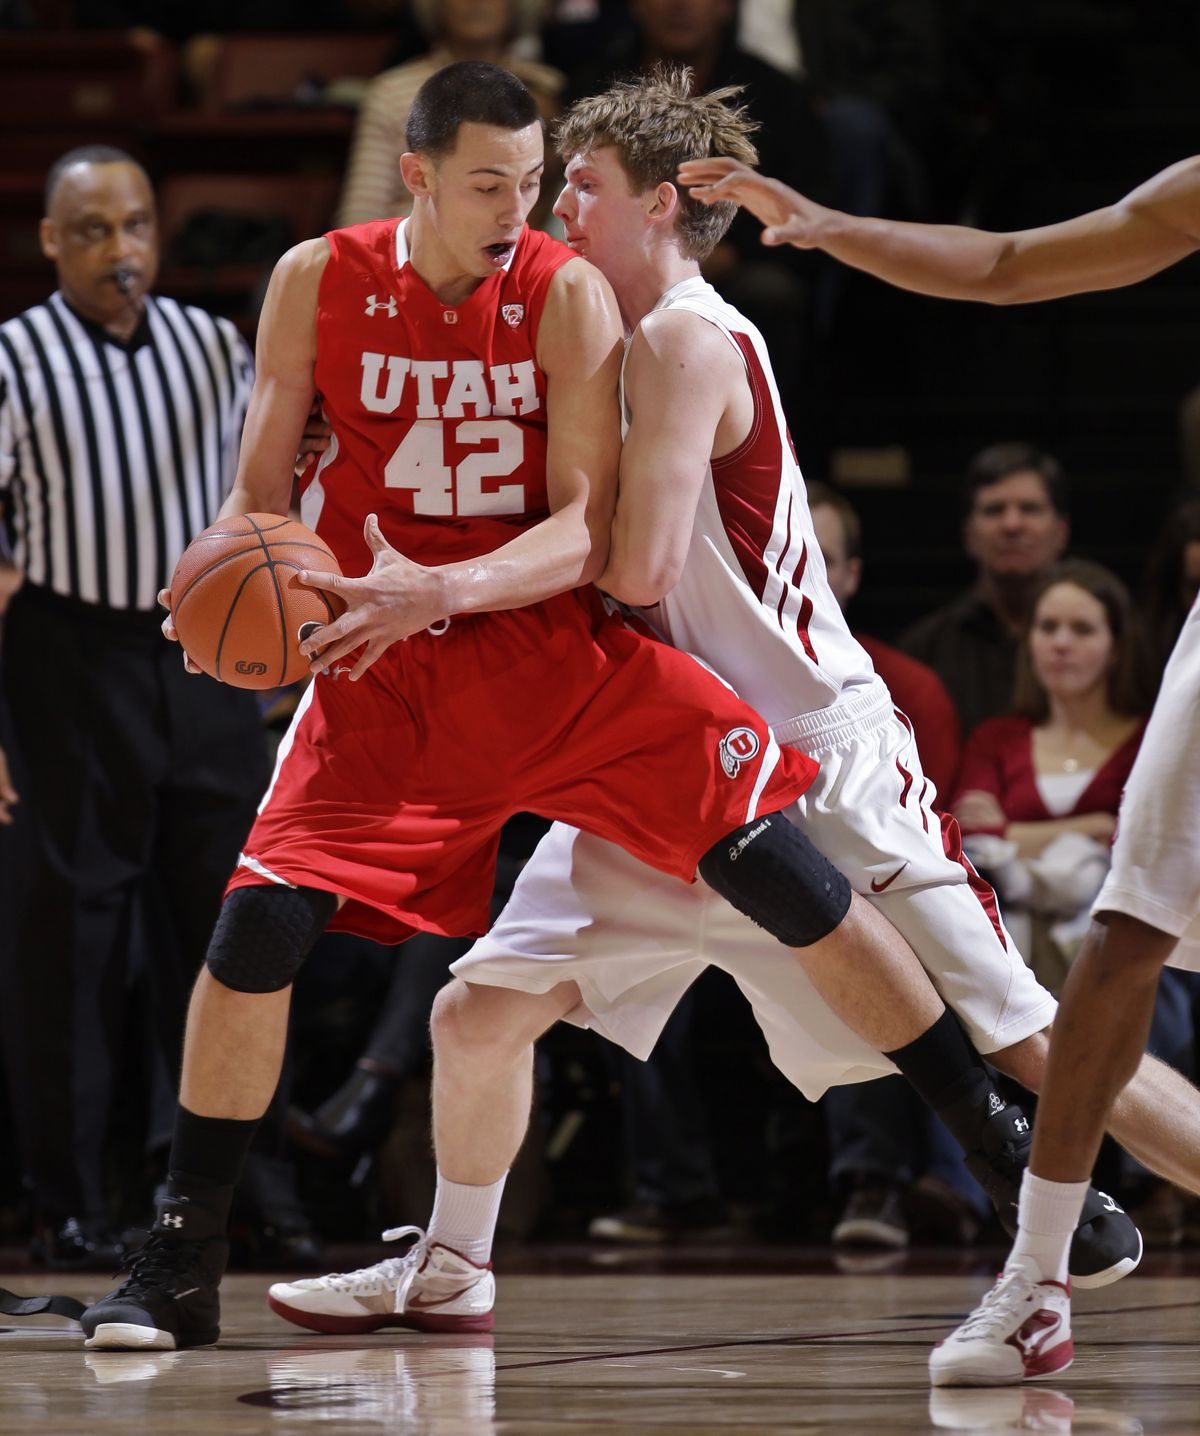 Stanford forward John Gage, right, guards Utah center Jason Washburn during game in Stanford, Calif., Thursday, Jan. 12, 2012. (AP Photo/Paul Sakuma)